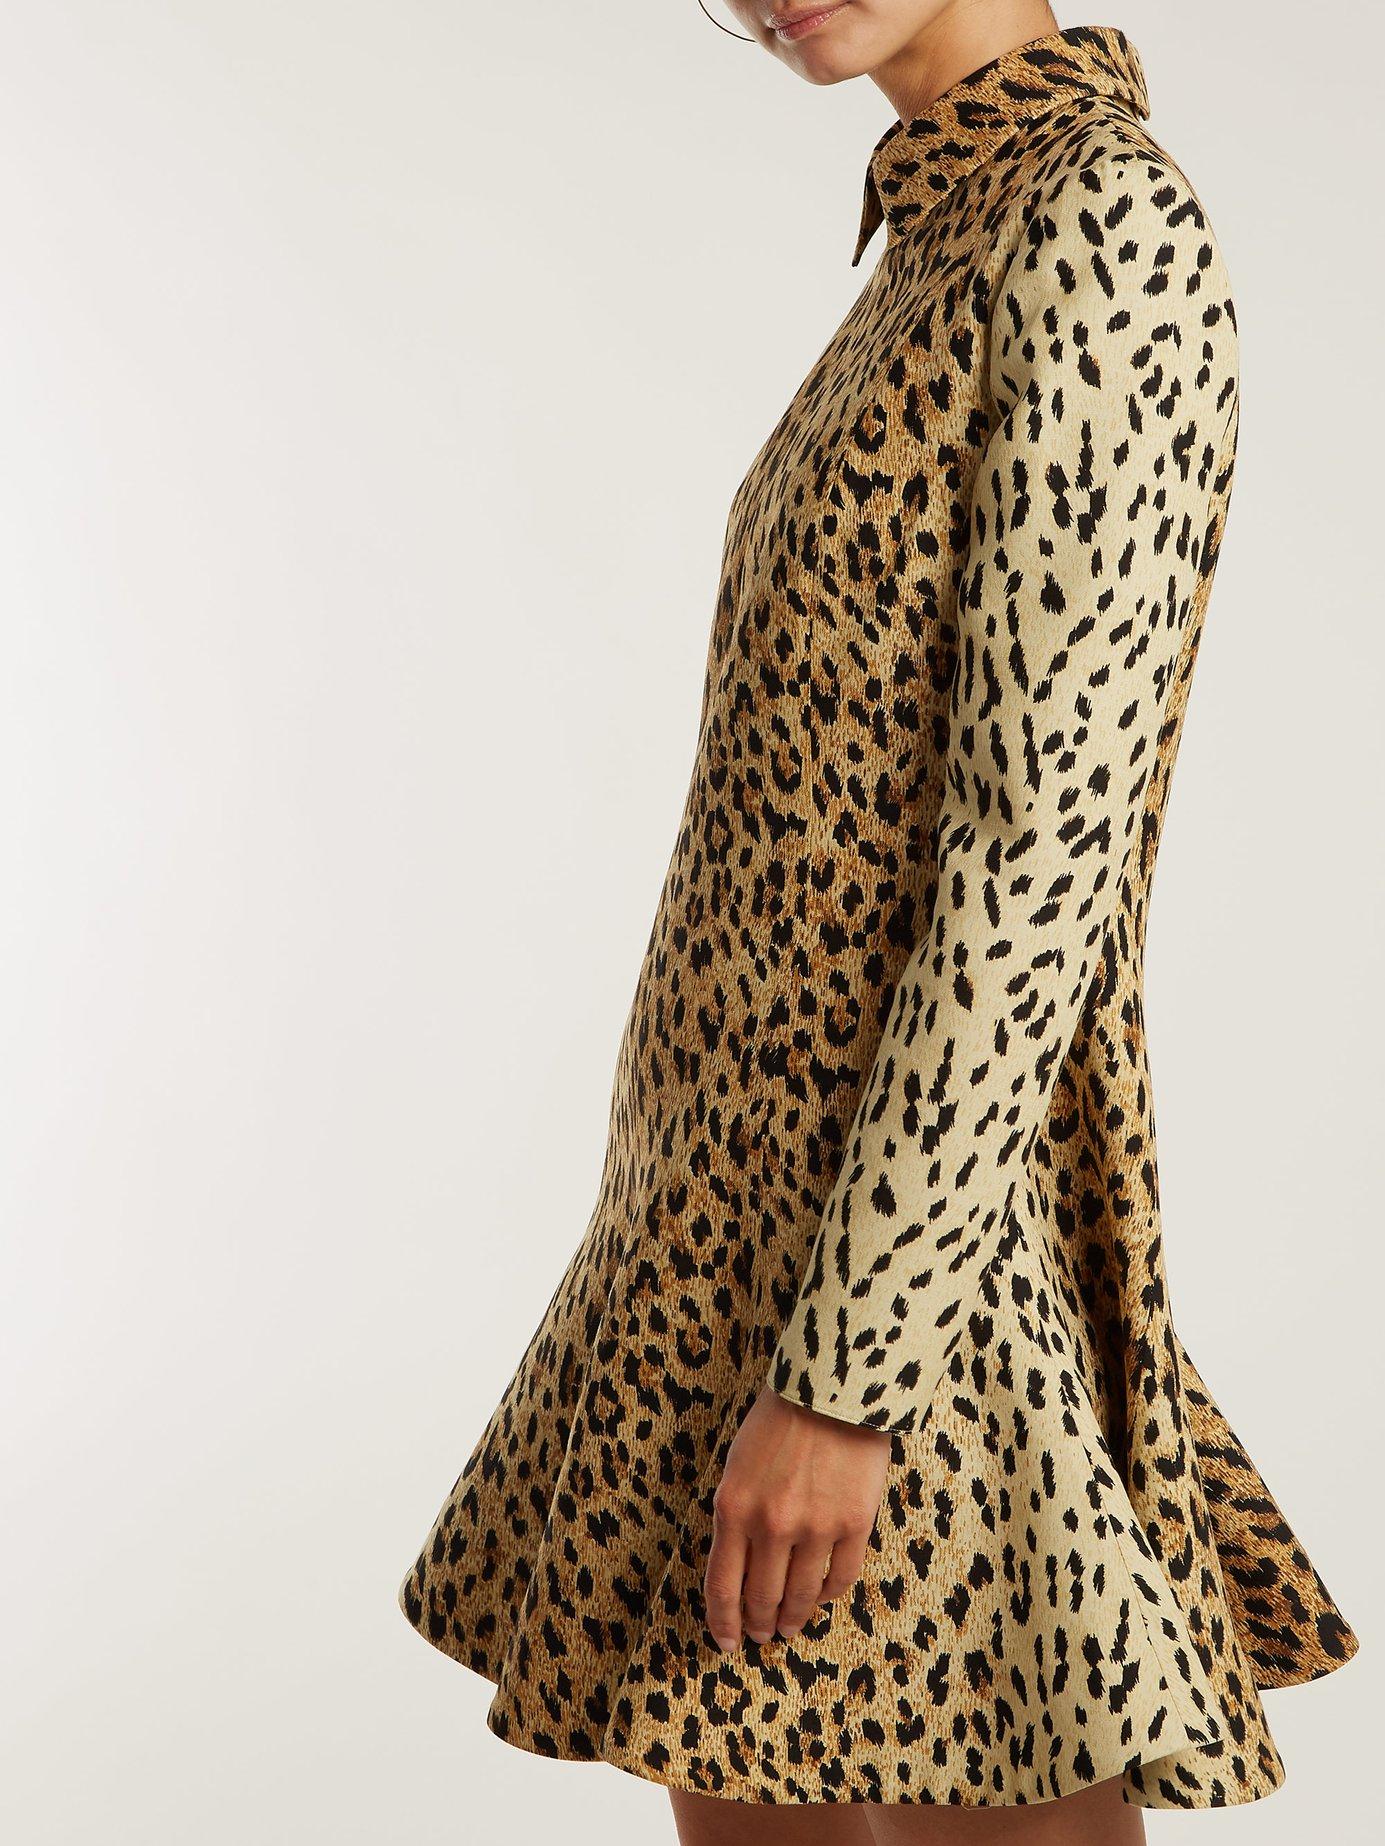 Leopard-print wool-silk crepe dress by Valentino